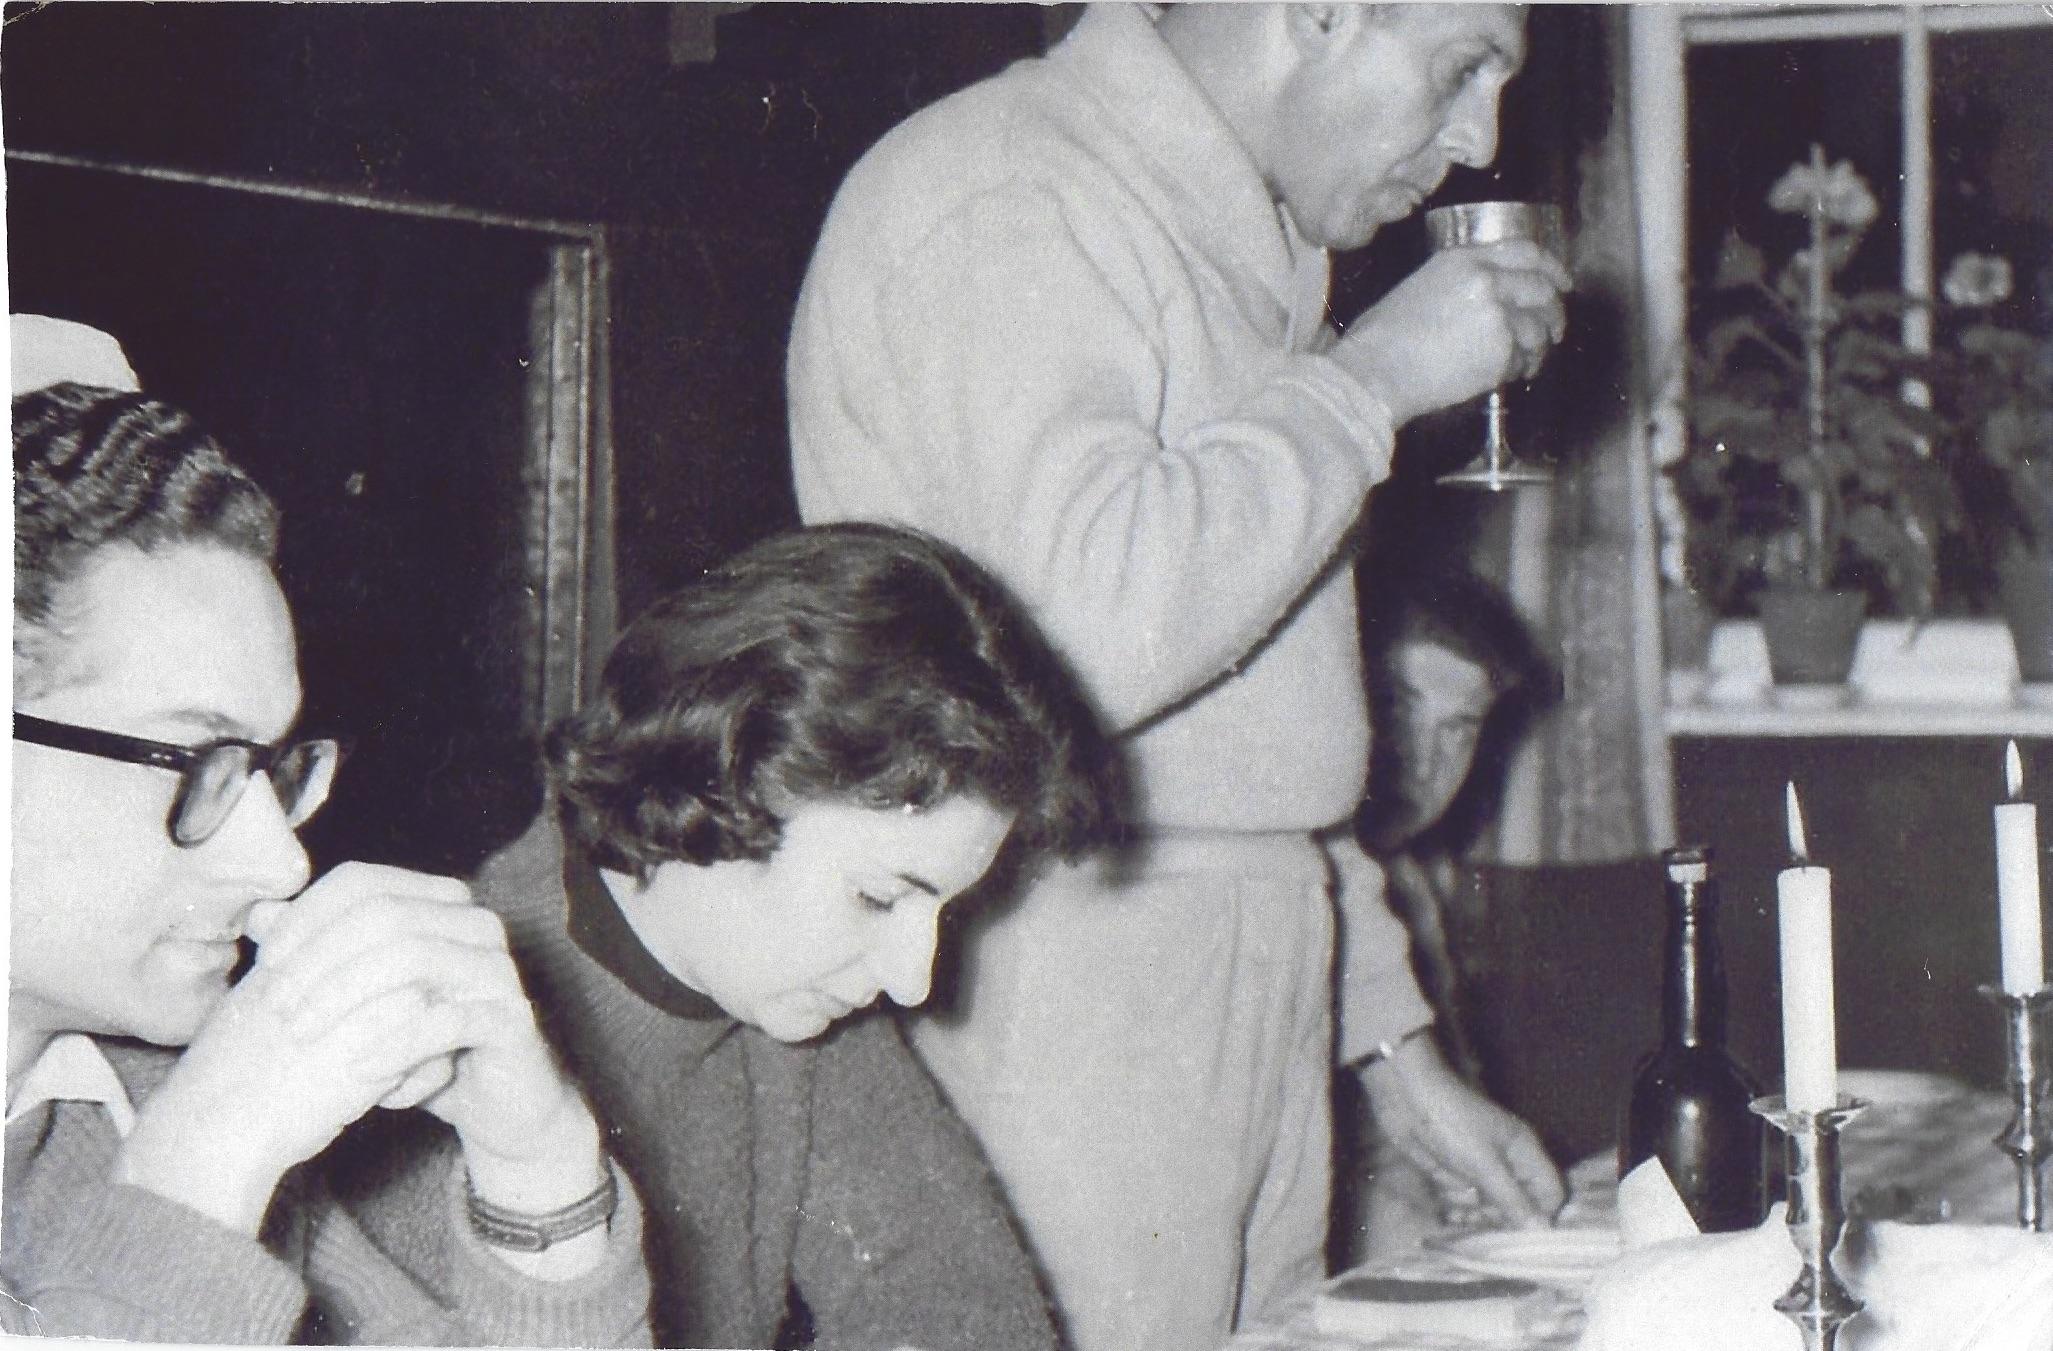 C2041 Barbara Igra - Bernard Igra - Yogi Mayer - Allen Spurling